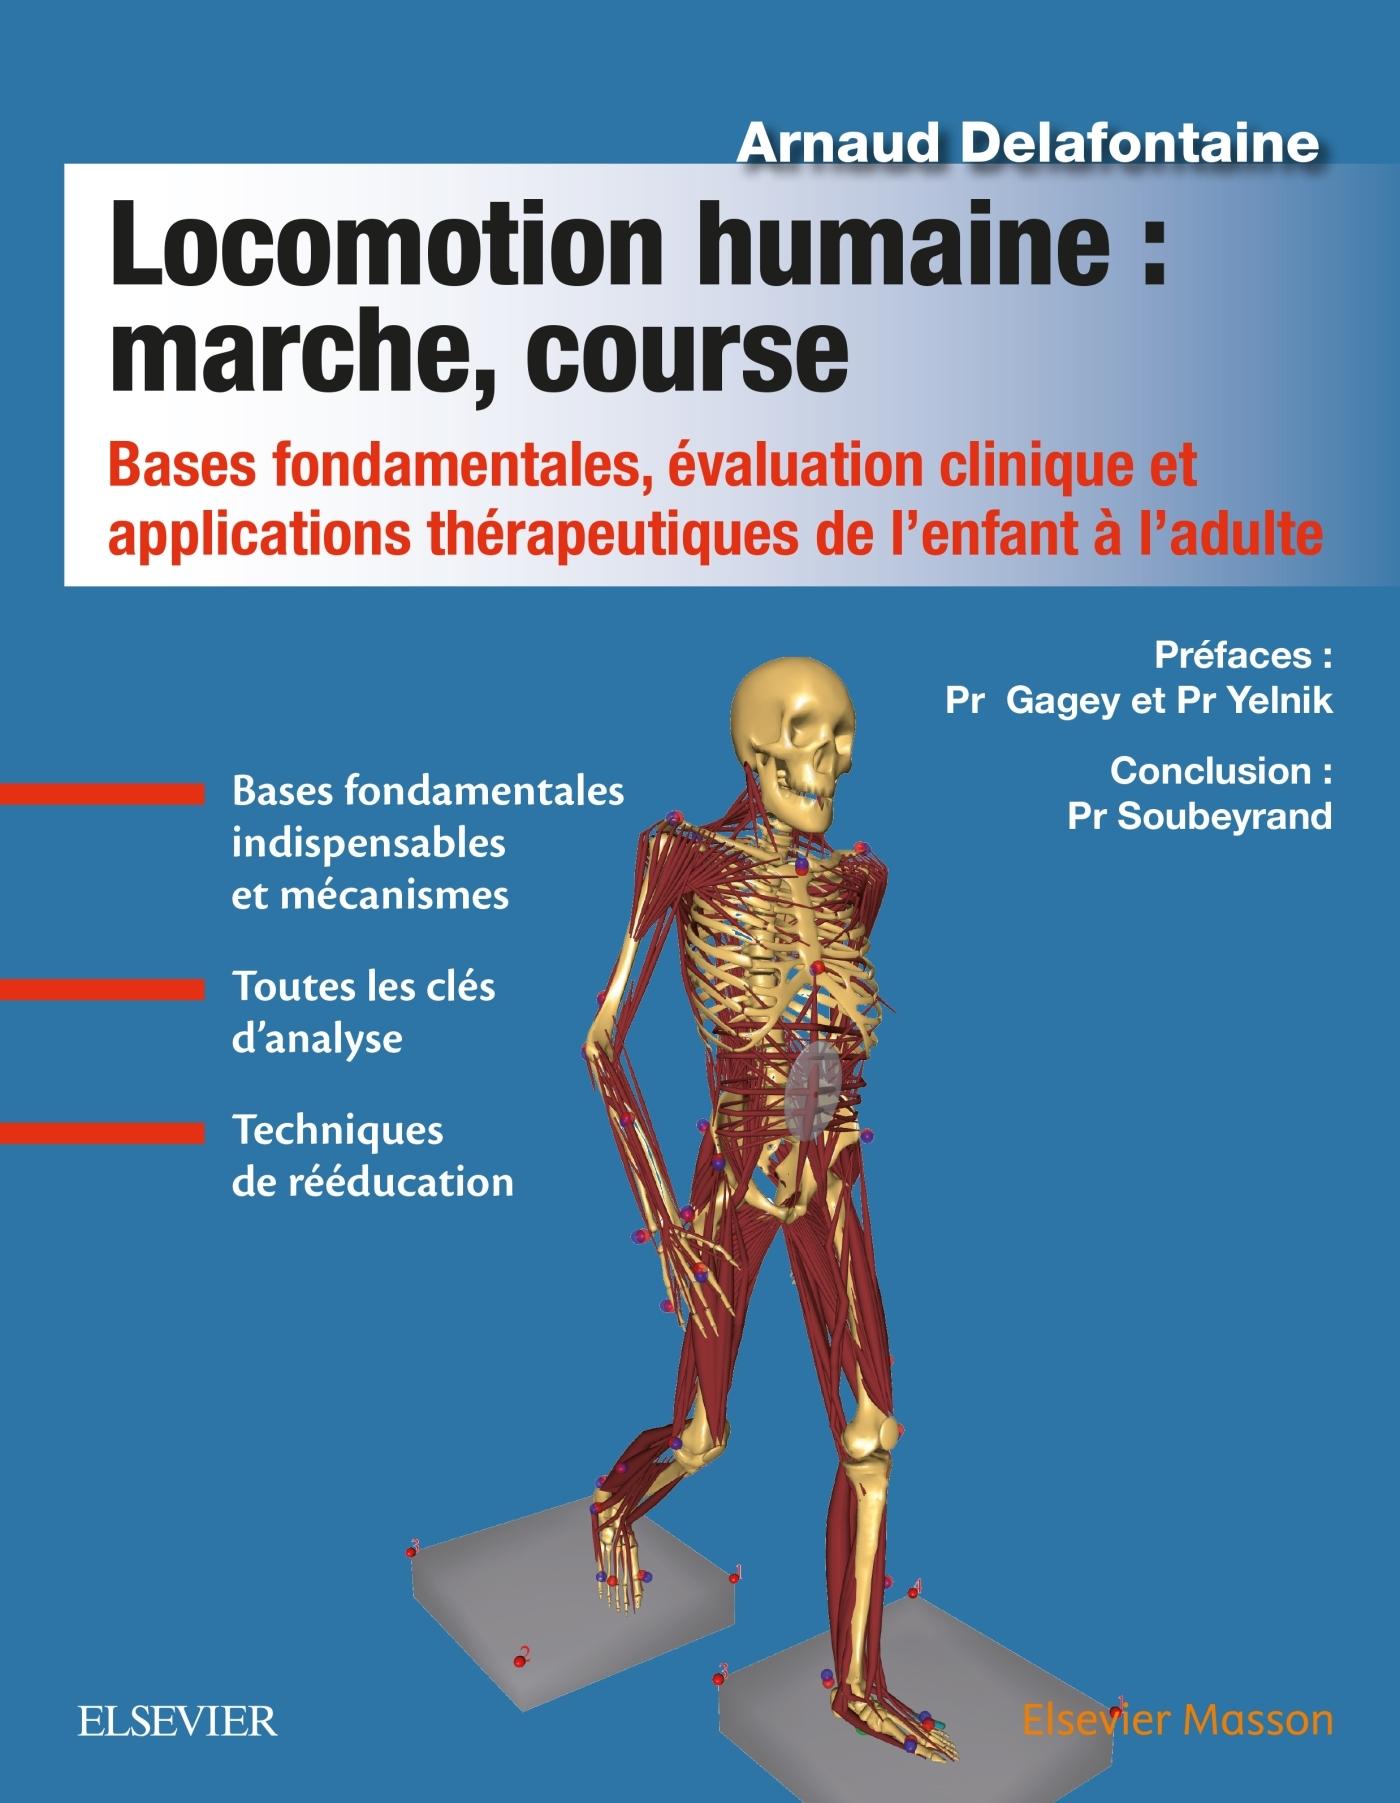 LOCOMOTION HUMAINE : MARCHE, COURSE